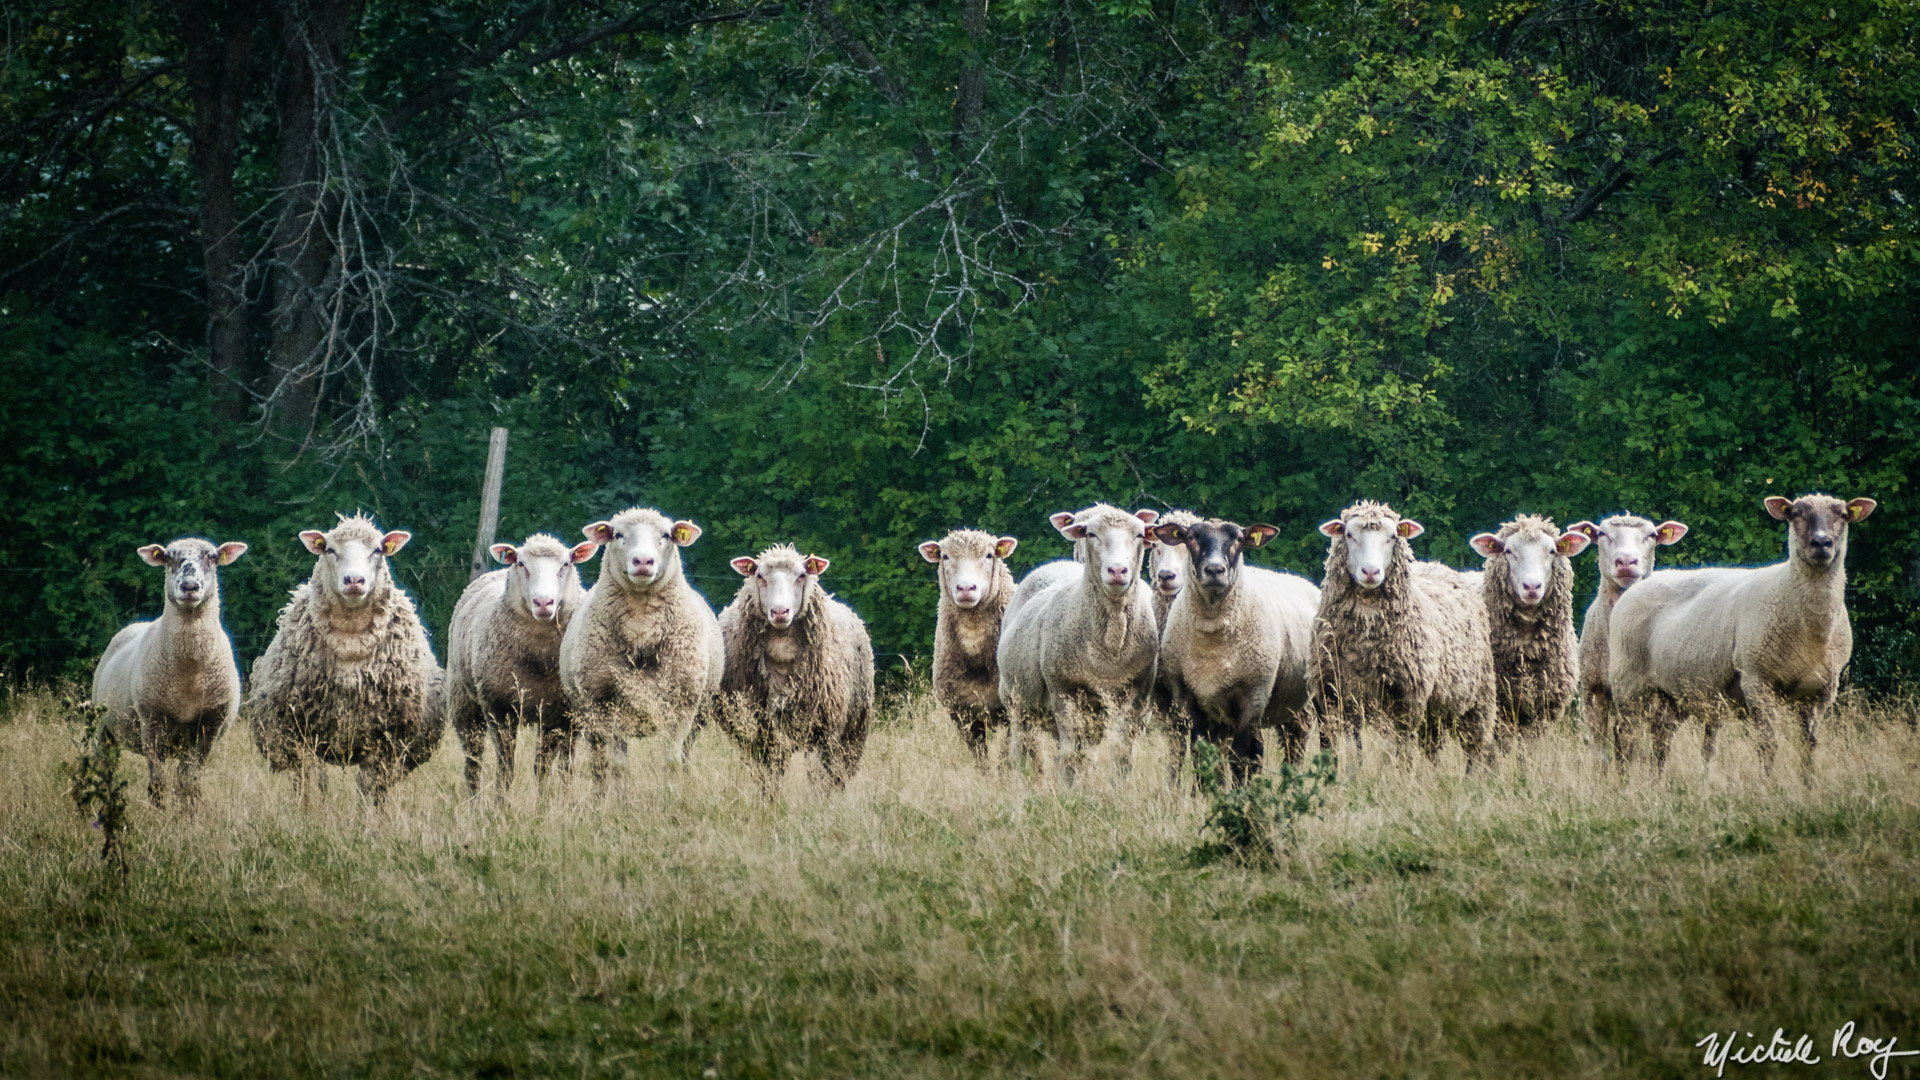 Moutons au pacage / Sheep grazing